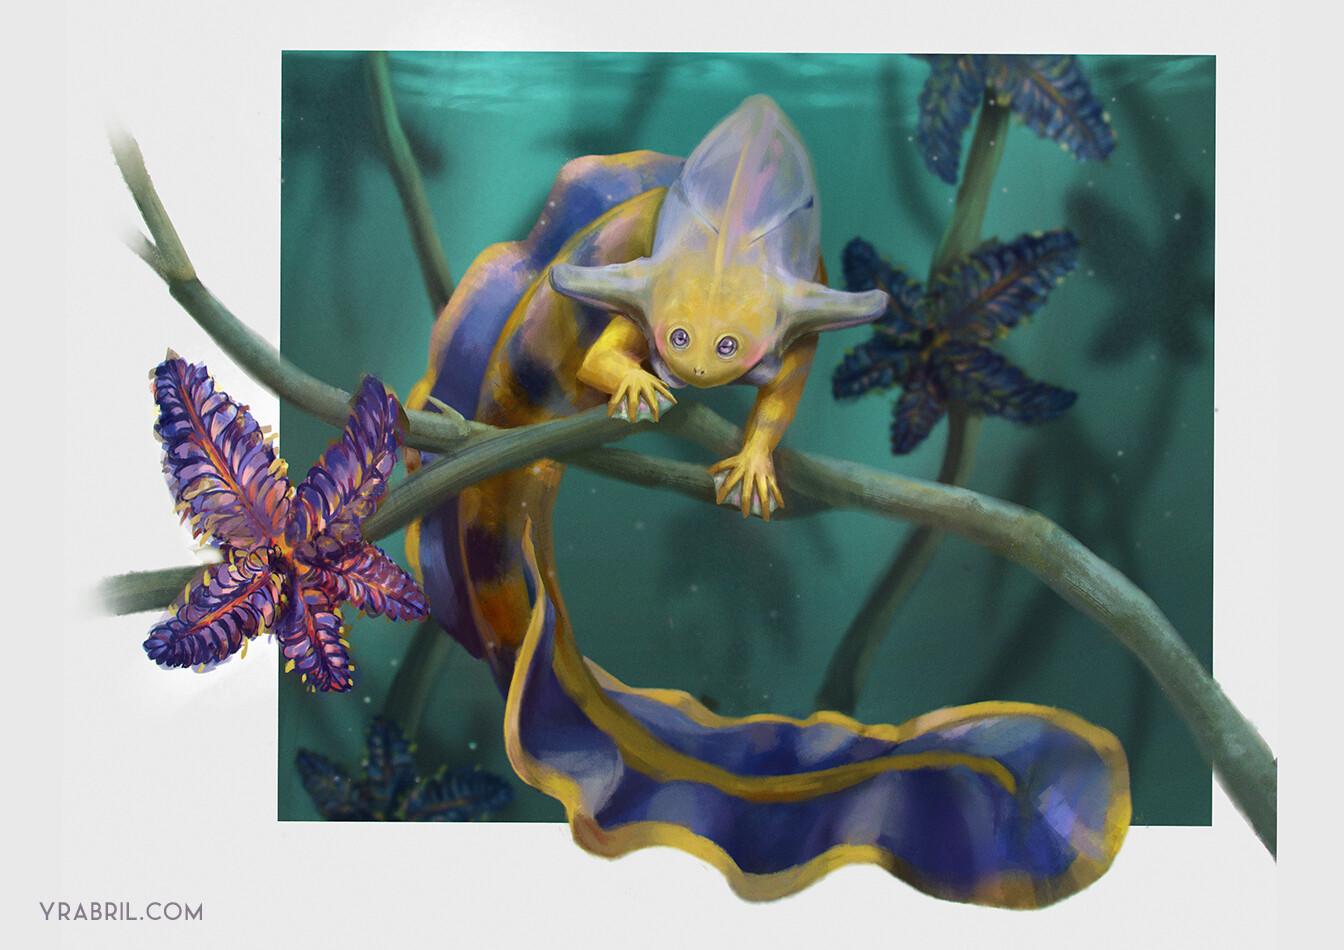 Creature design - Presentation